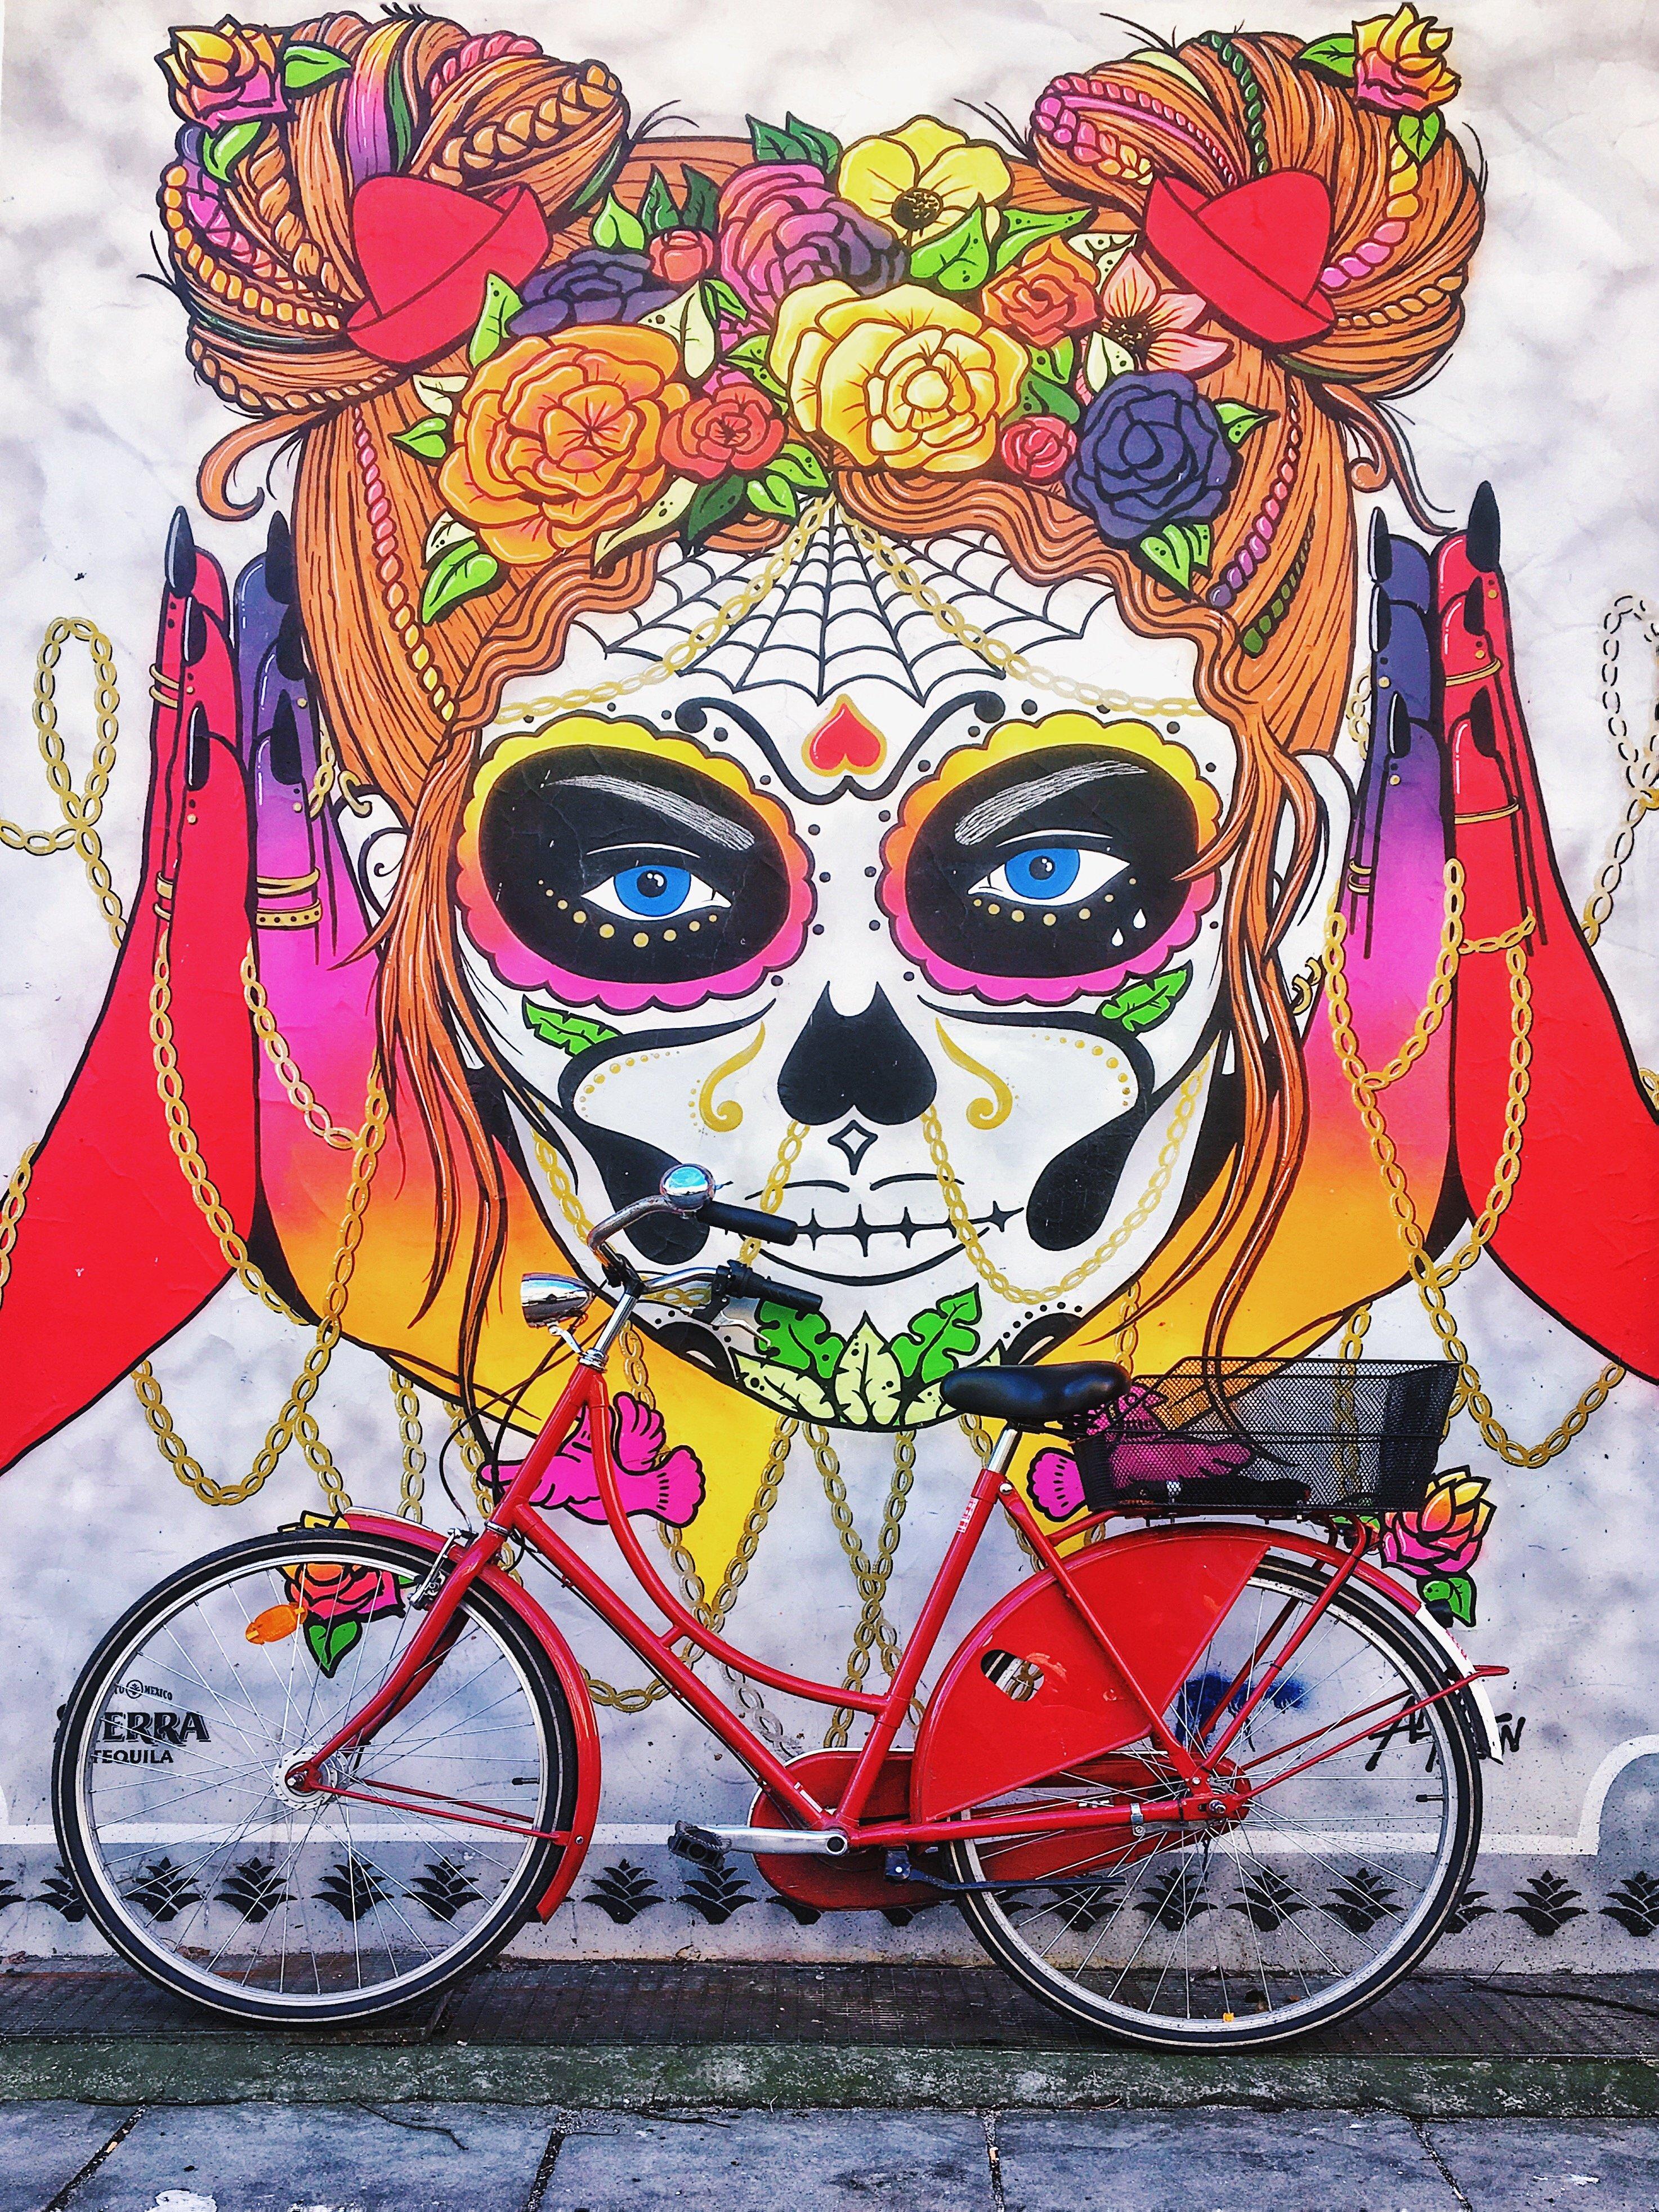 Streetart Hamburg: Graffiti Anna T.Iron Santa Muerte Paul Roosen Str, Frau Elbville Hamburg Companion